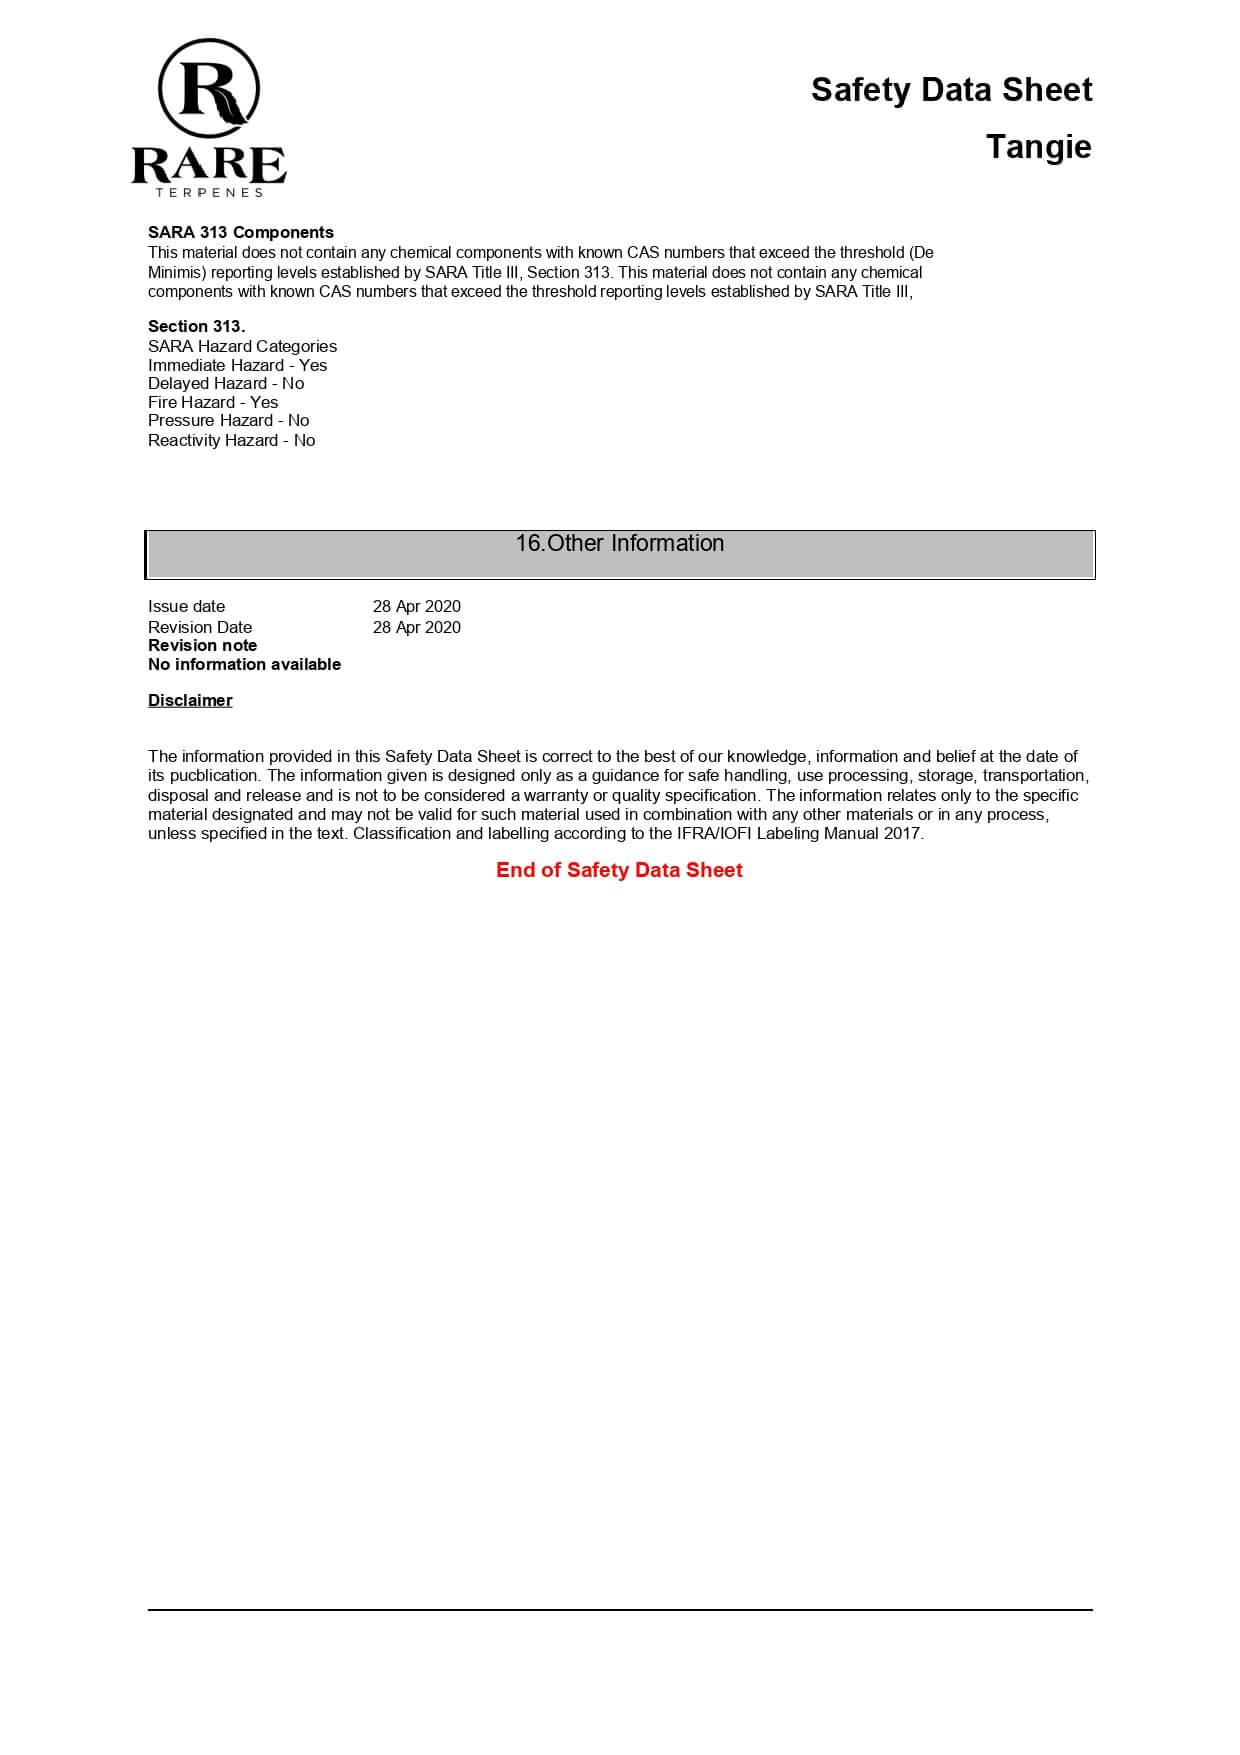 Rare Terpenes Tepene Strain Blends Tangie Lab Report